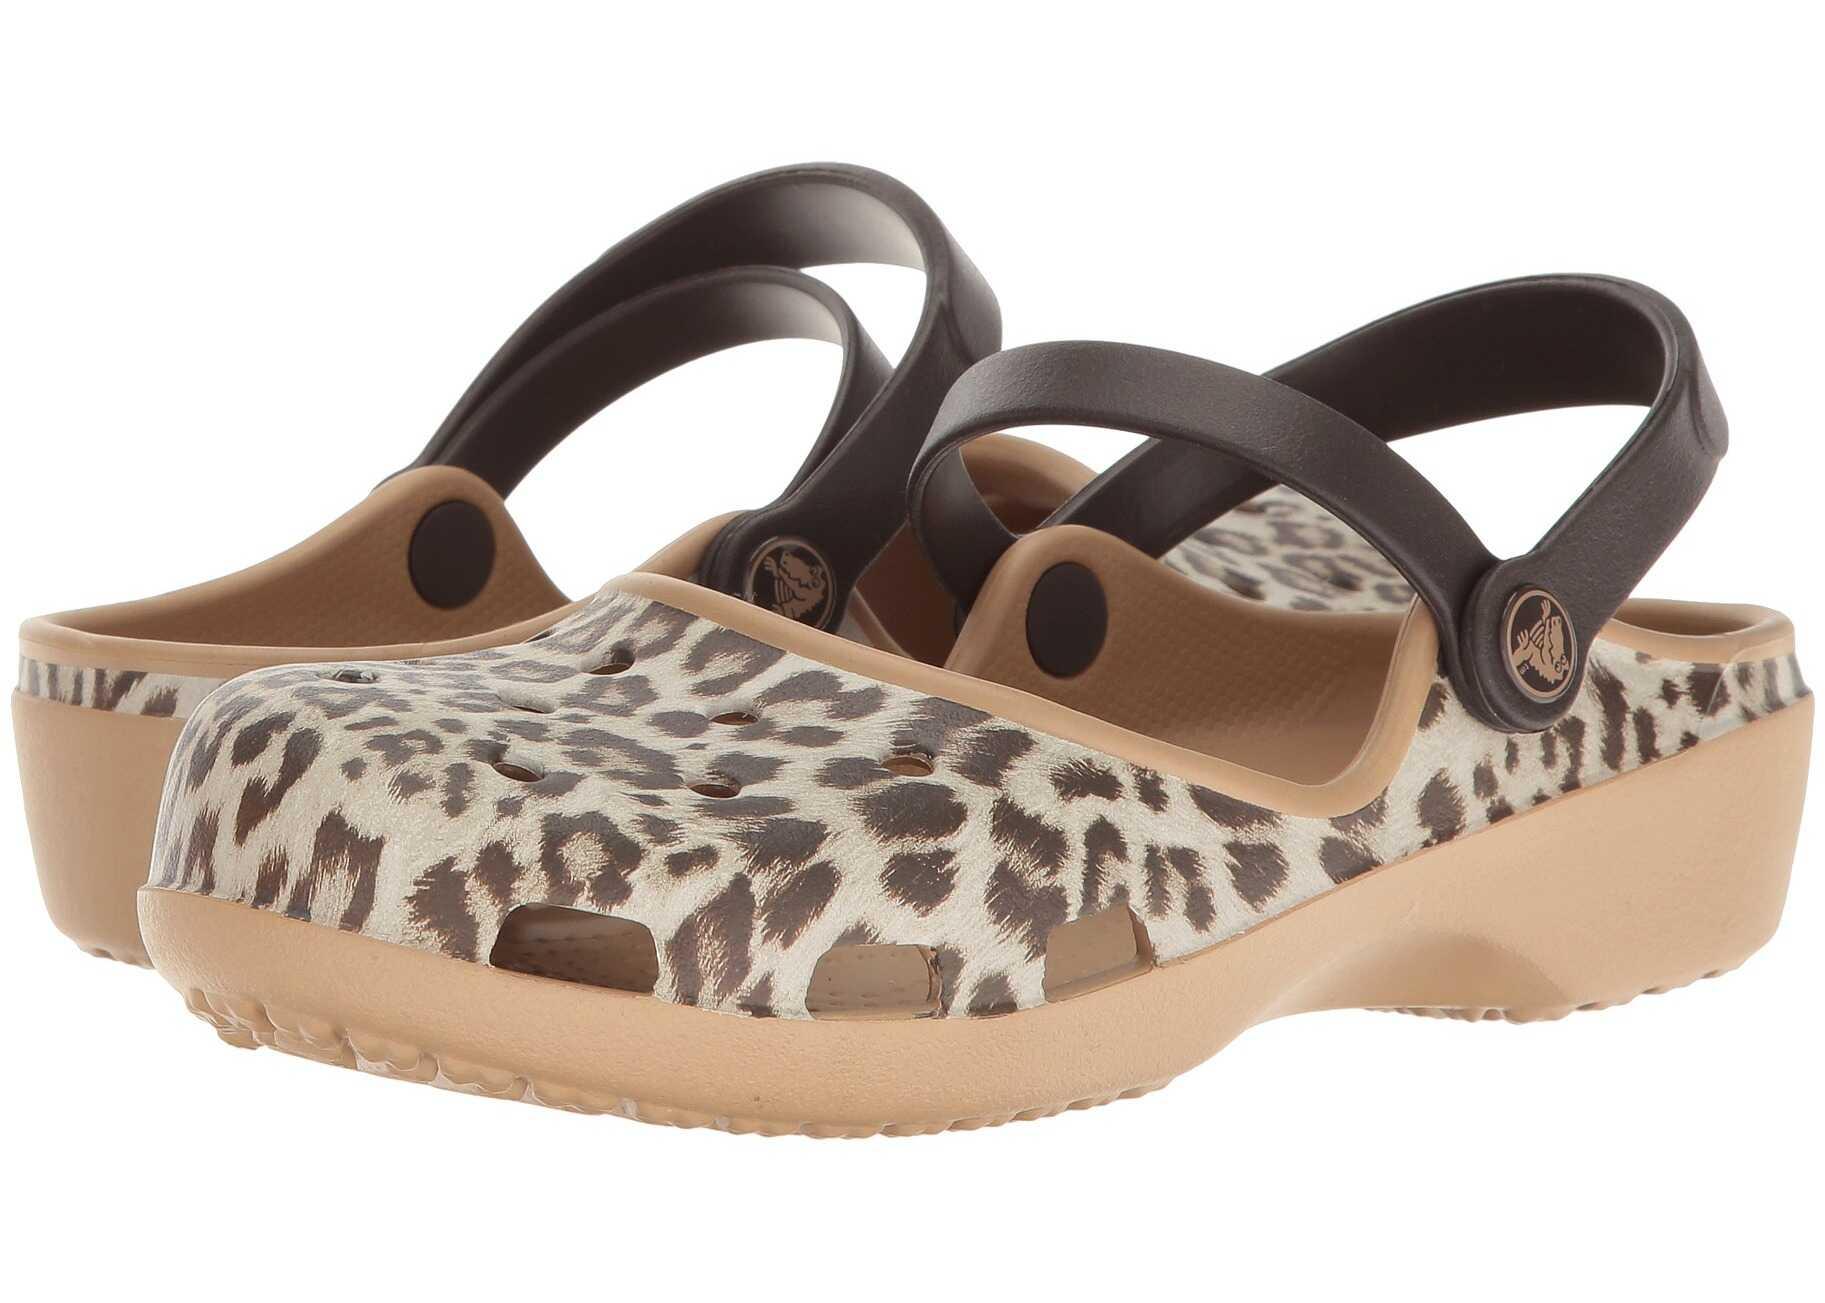 Crocs Karin Graphic Clog Leopard